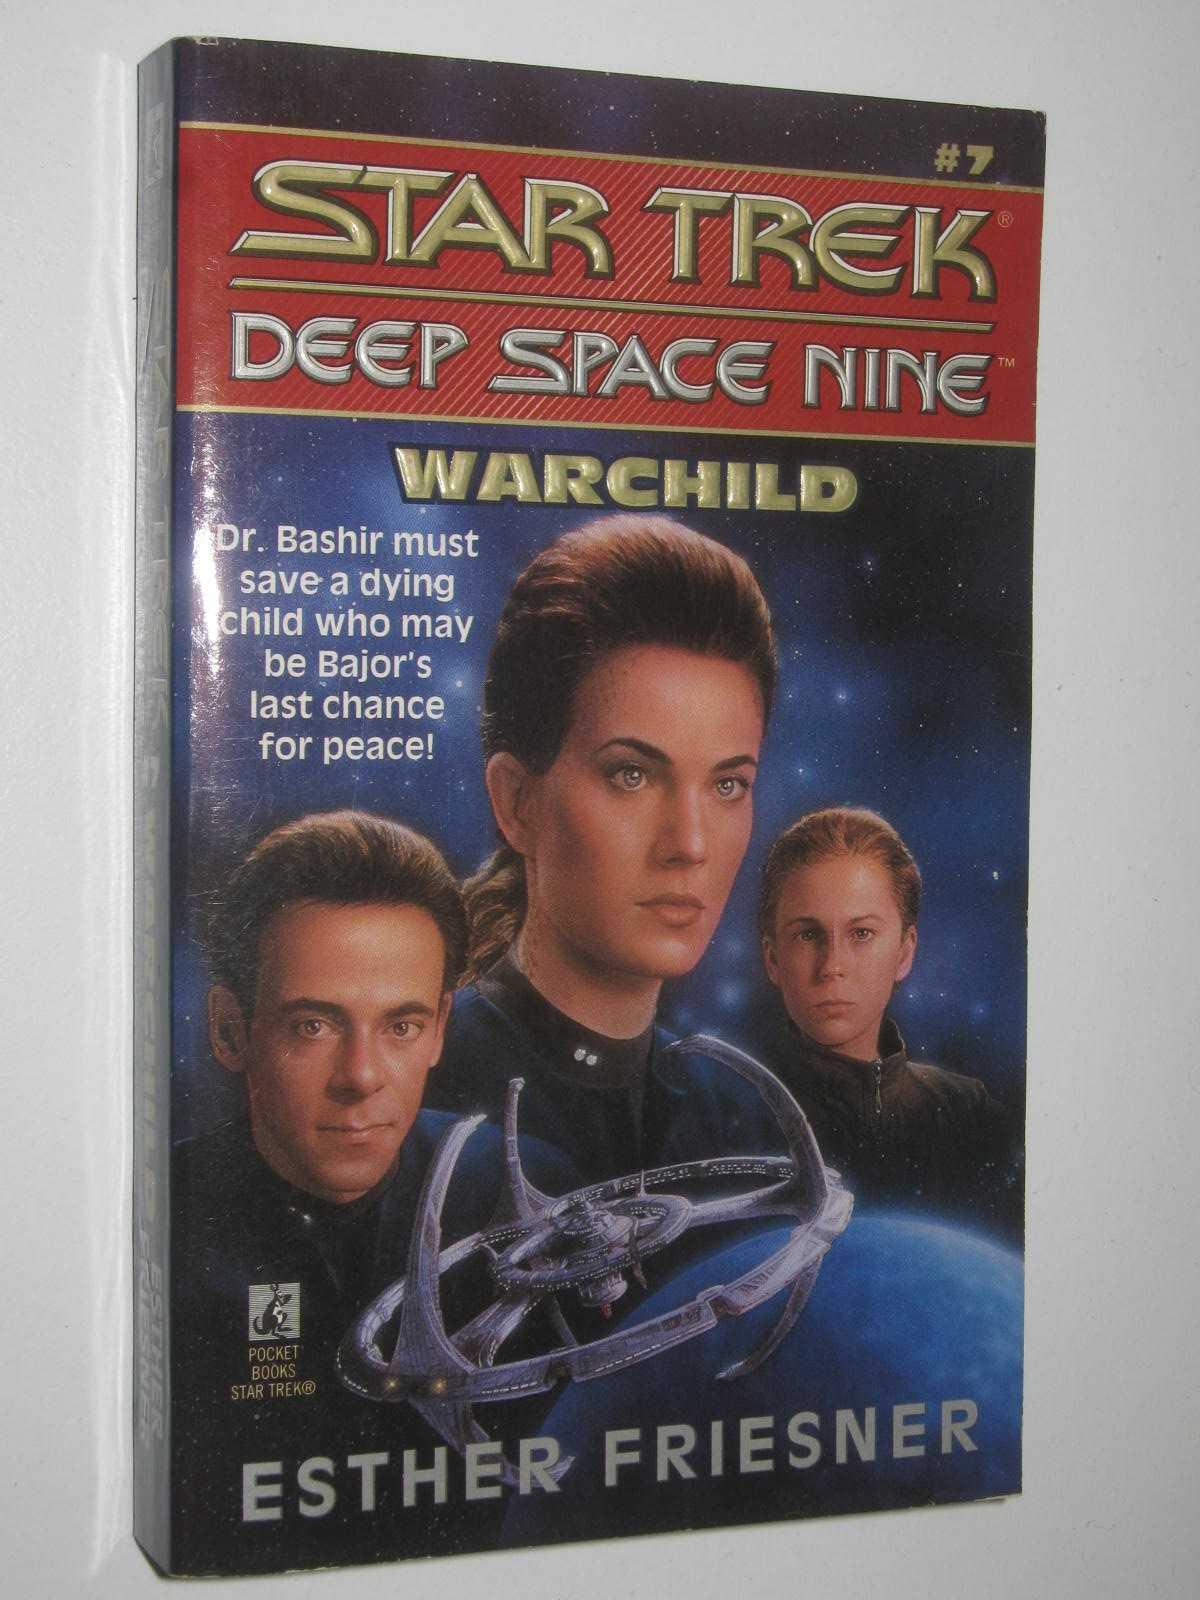 Image for Warchild - STAR TREK Deep Space Nine Series #7